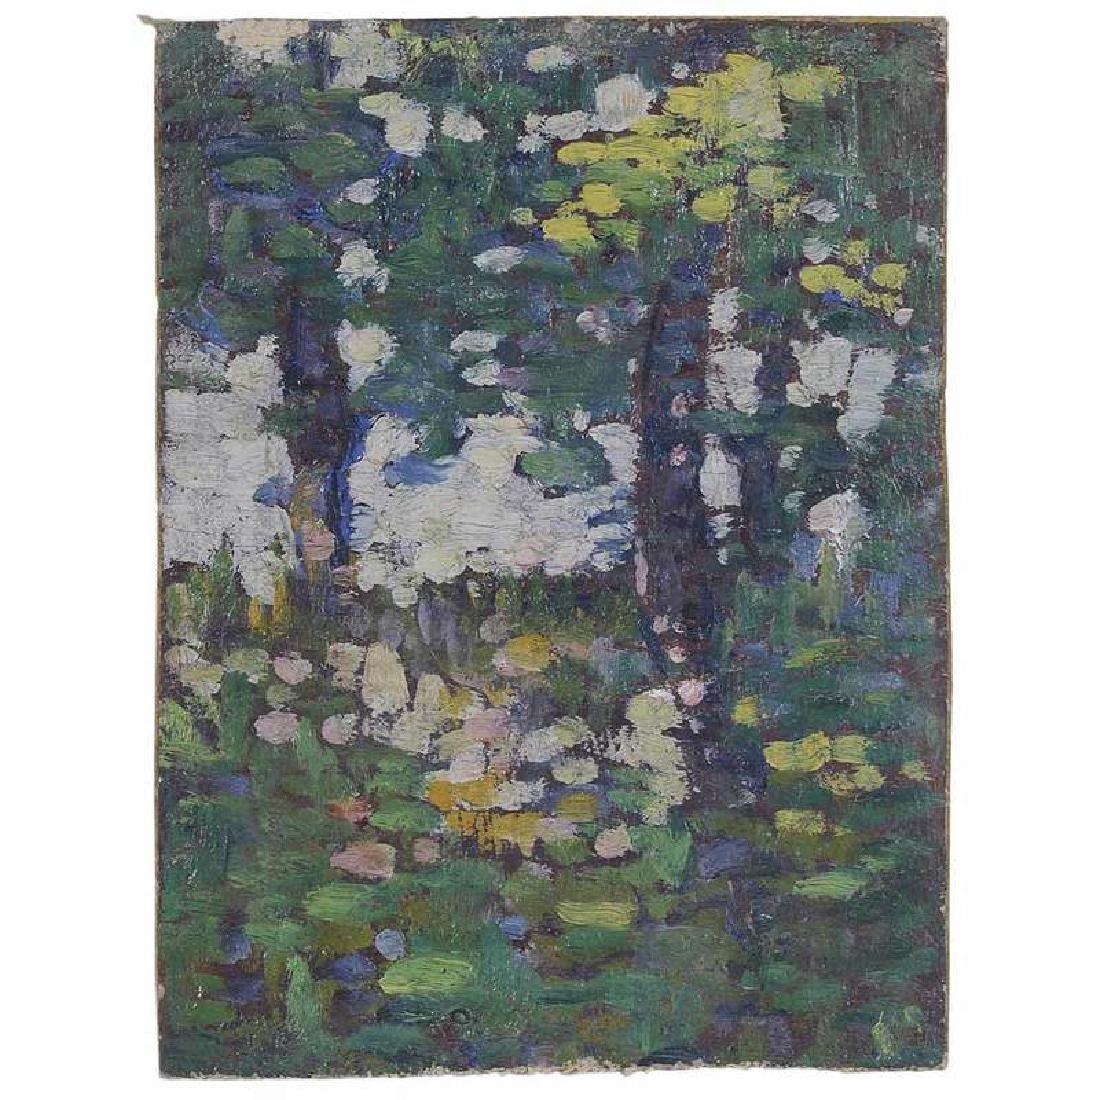 American Impressionist School - 2